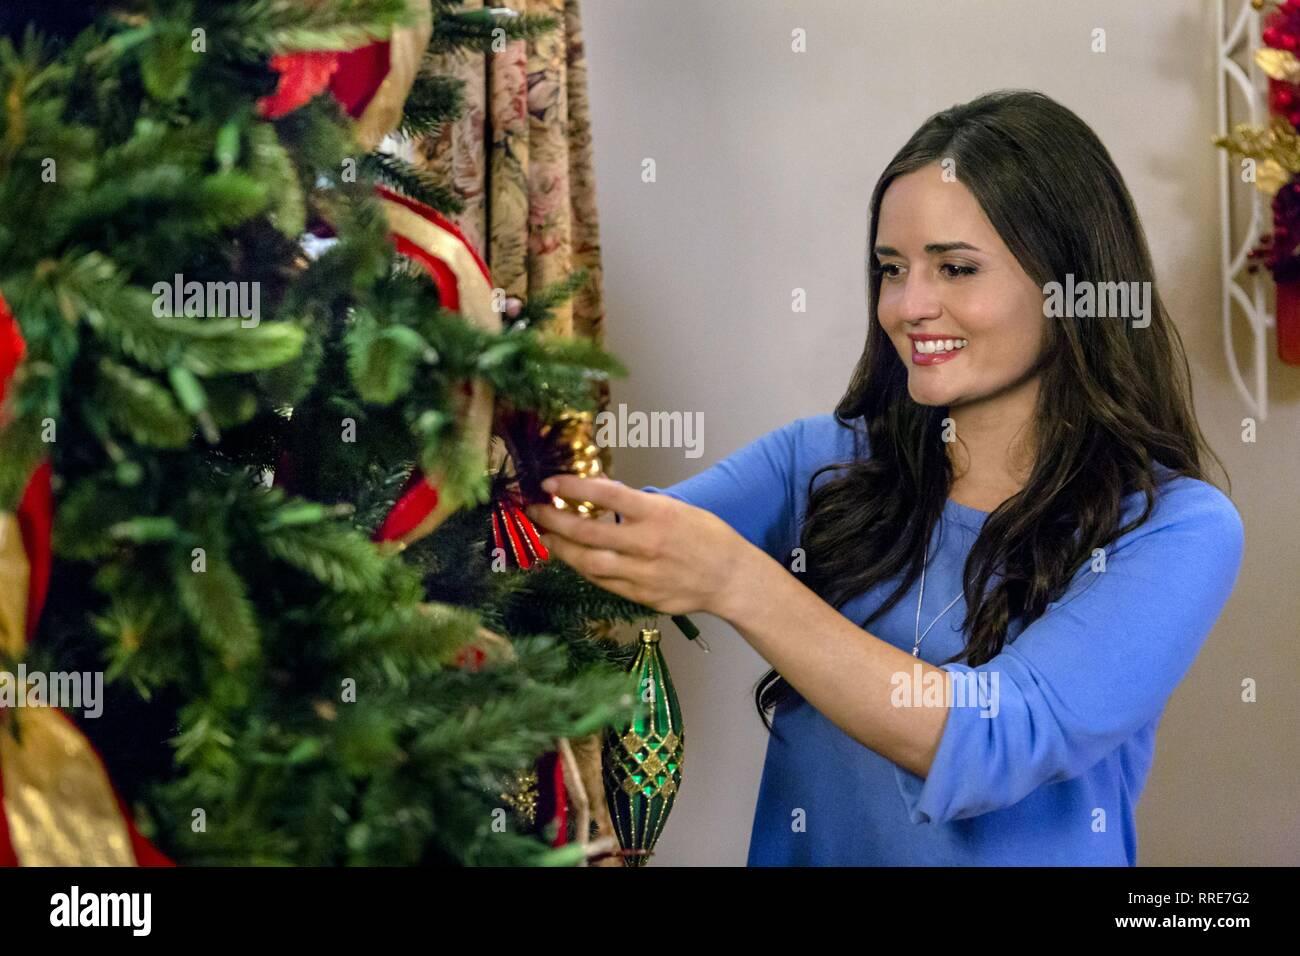 Coming Home For Christmas.Coming Home For Christmas Danica Mckellar 2017 Stock Photo